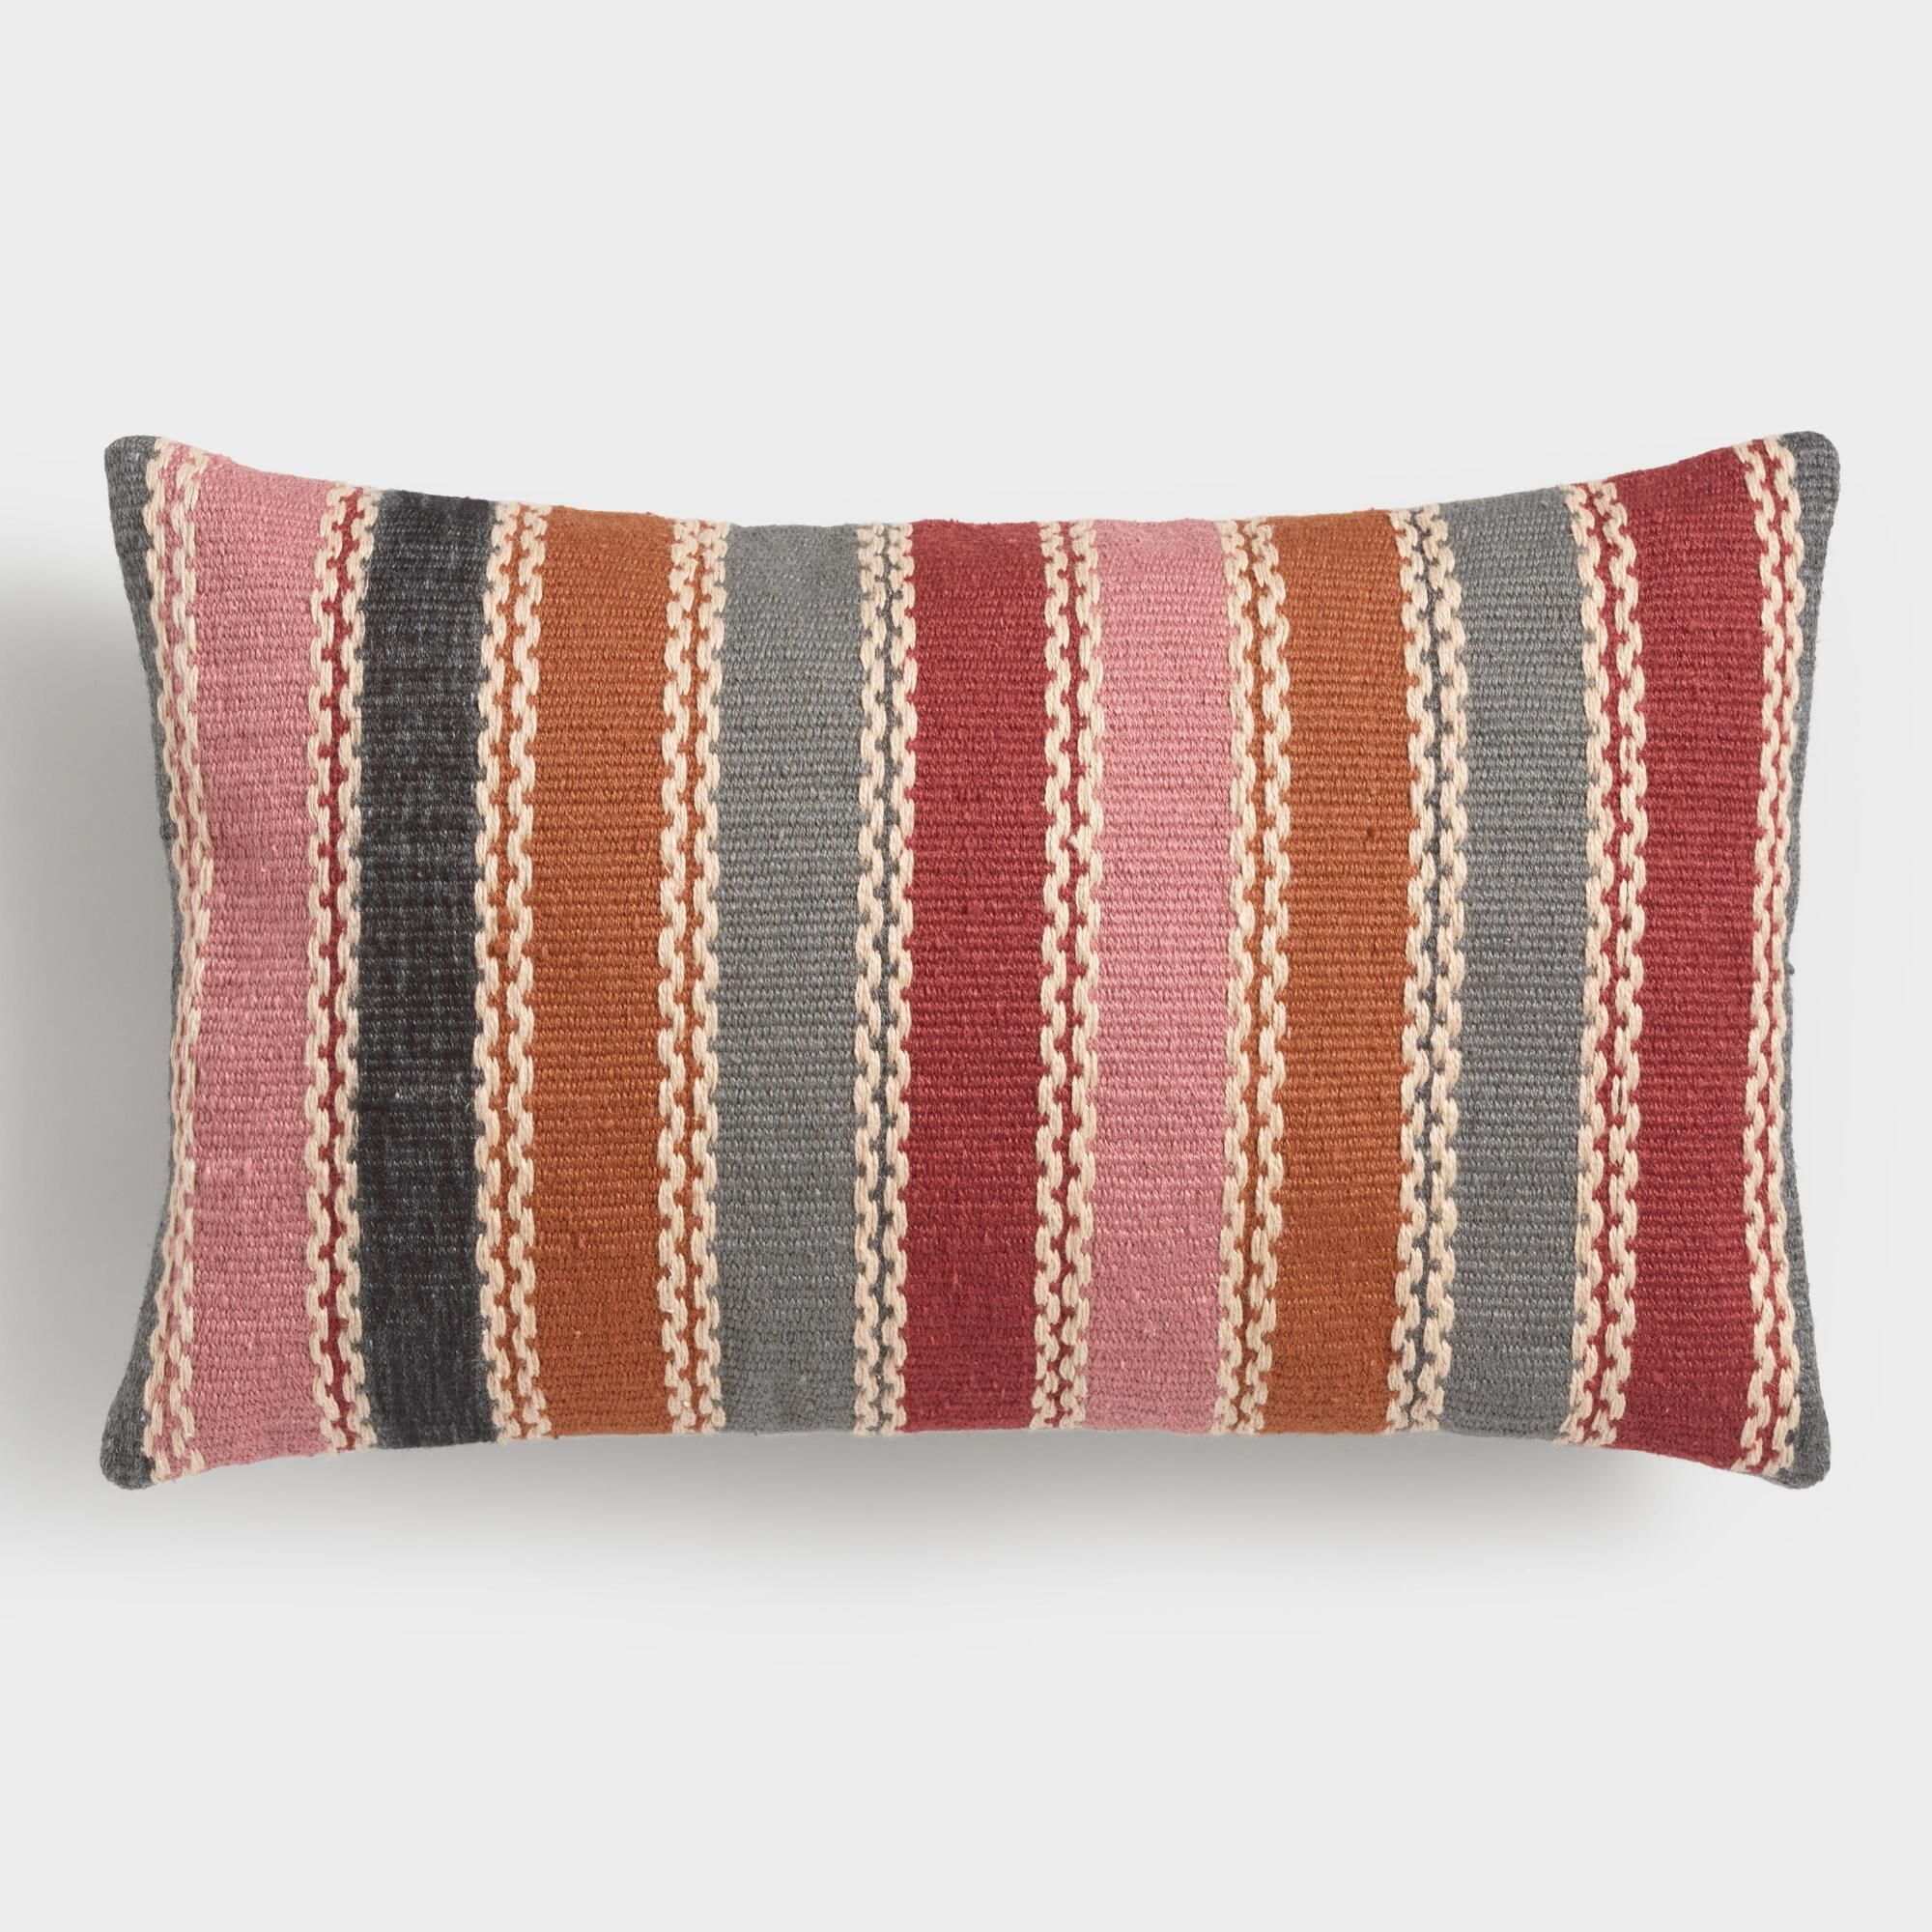 Bon Warm Multicolor Woven Indoor Outdoor Patio Lumbar Pillow By World Market